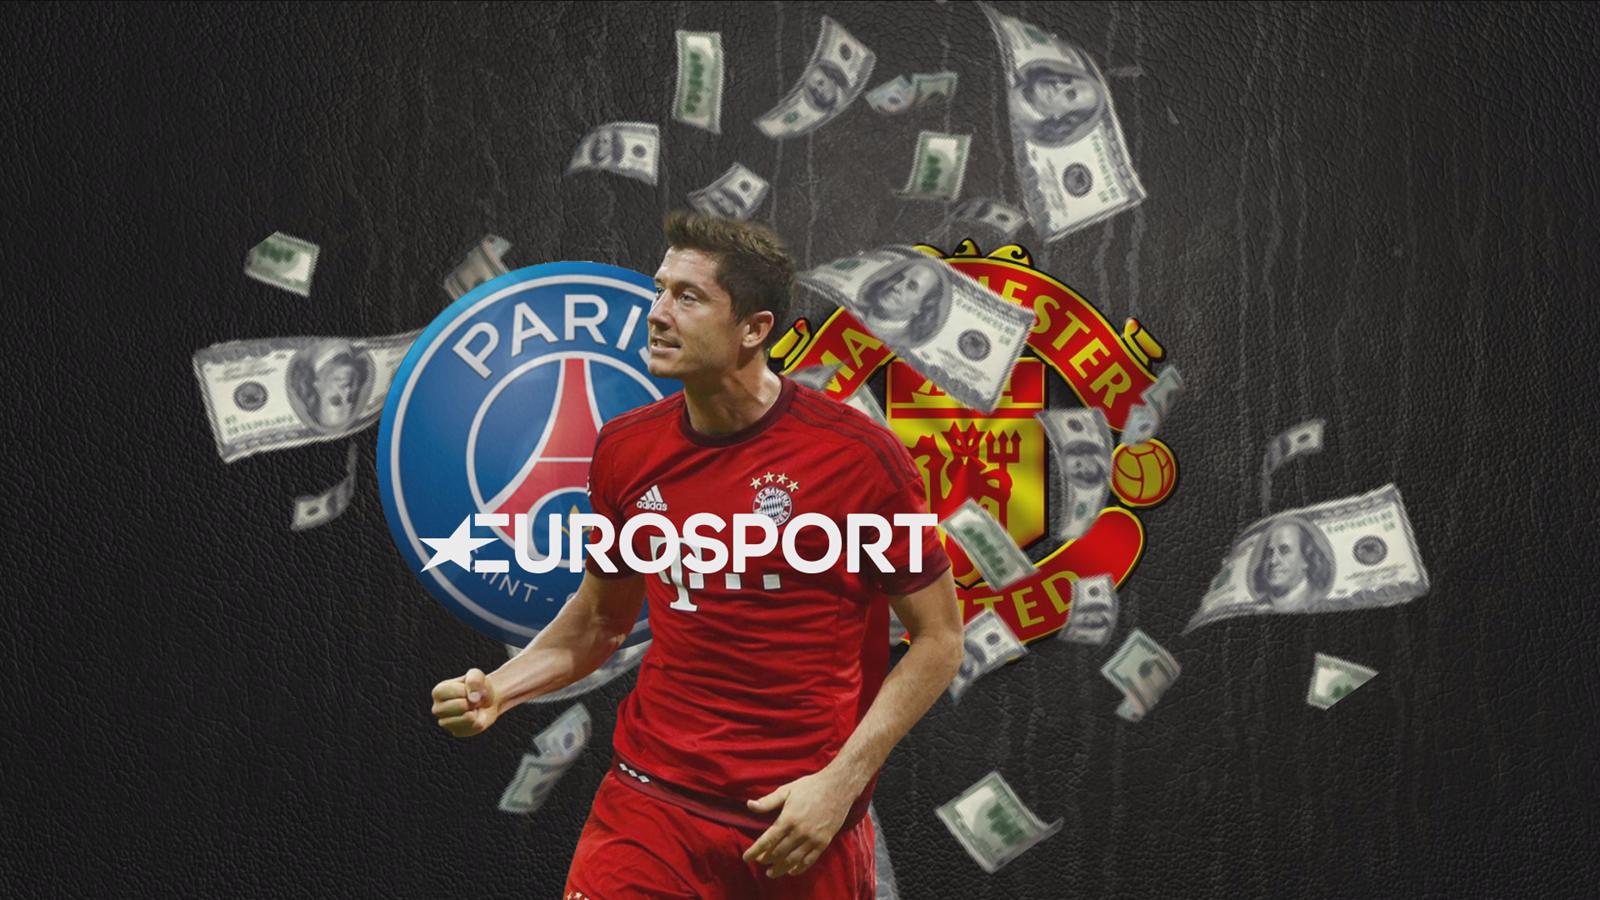 PSG & Man United tempt Lewandowski with €15m salary - Euro Papers